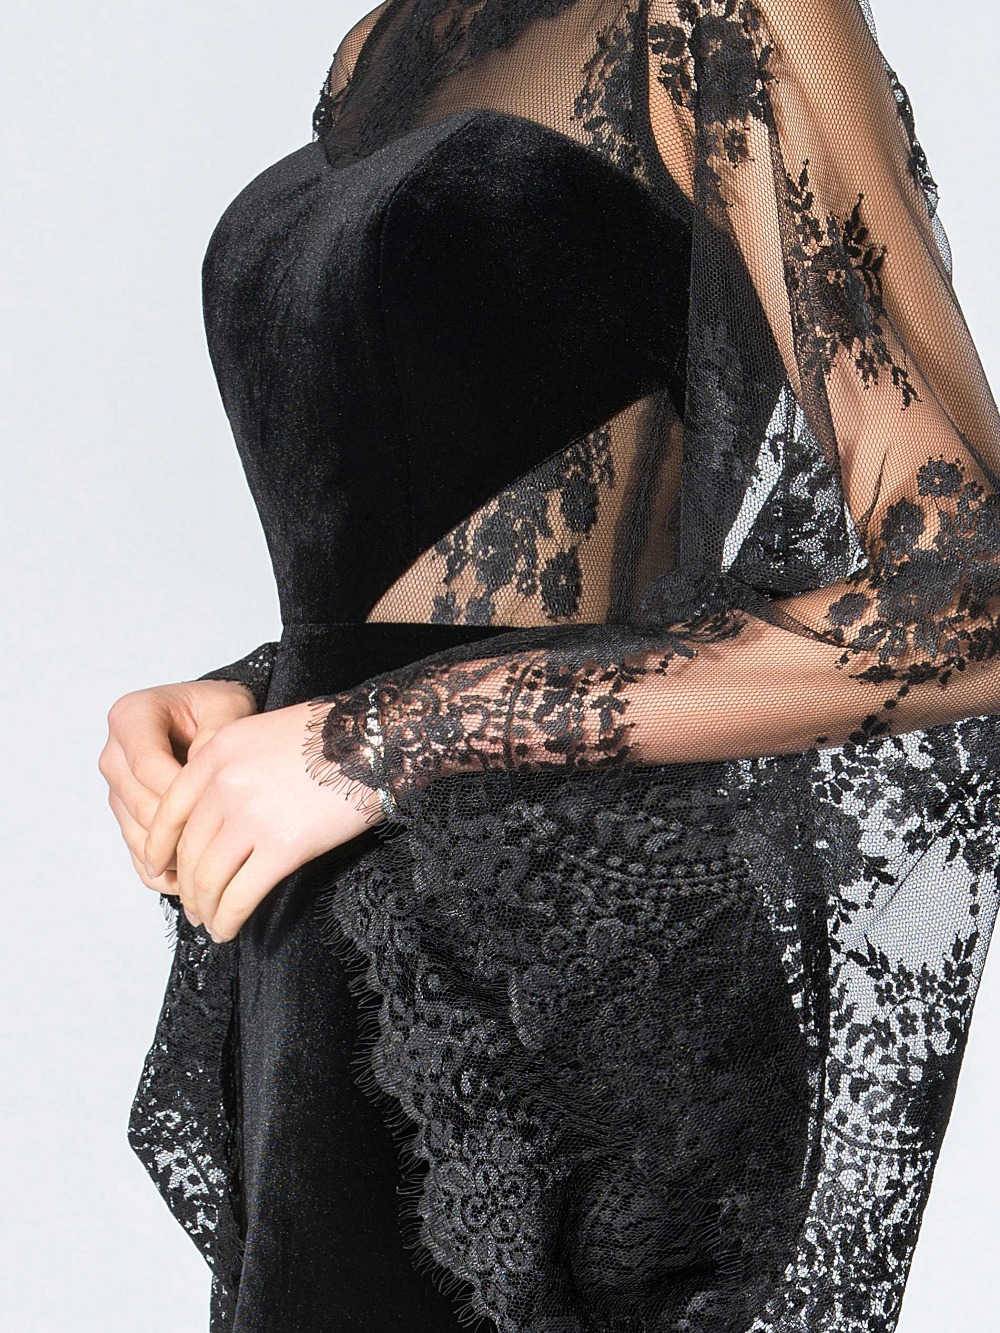 Dressv Vintage čipke muslimanske večernje haljine plašt O-vrat - Haljina za posebne prigode - Foto 5